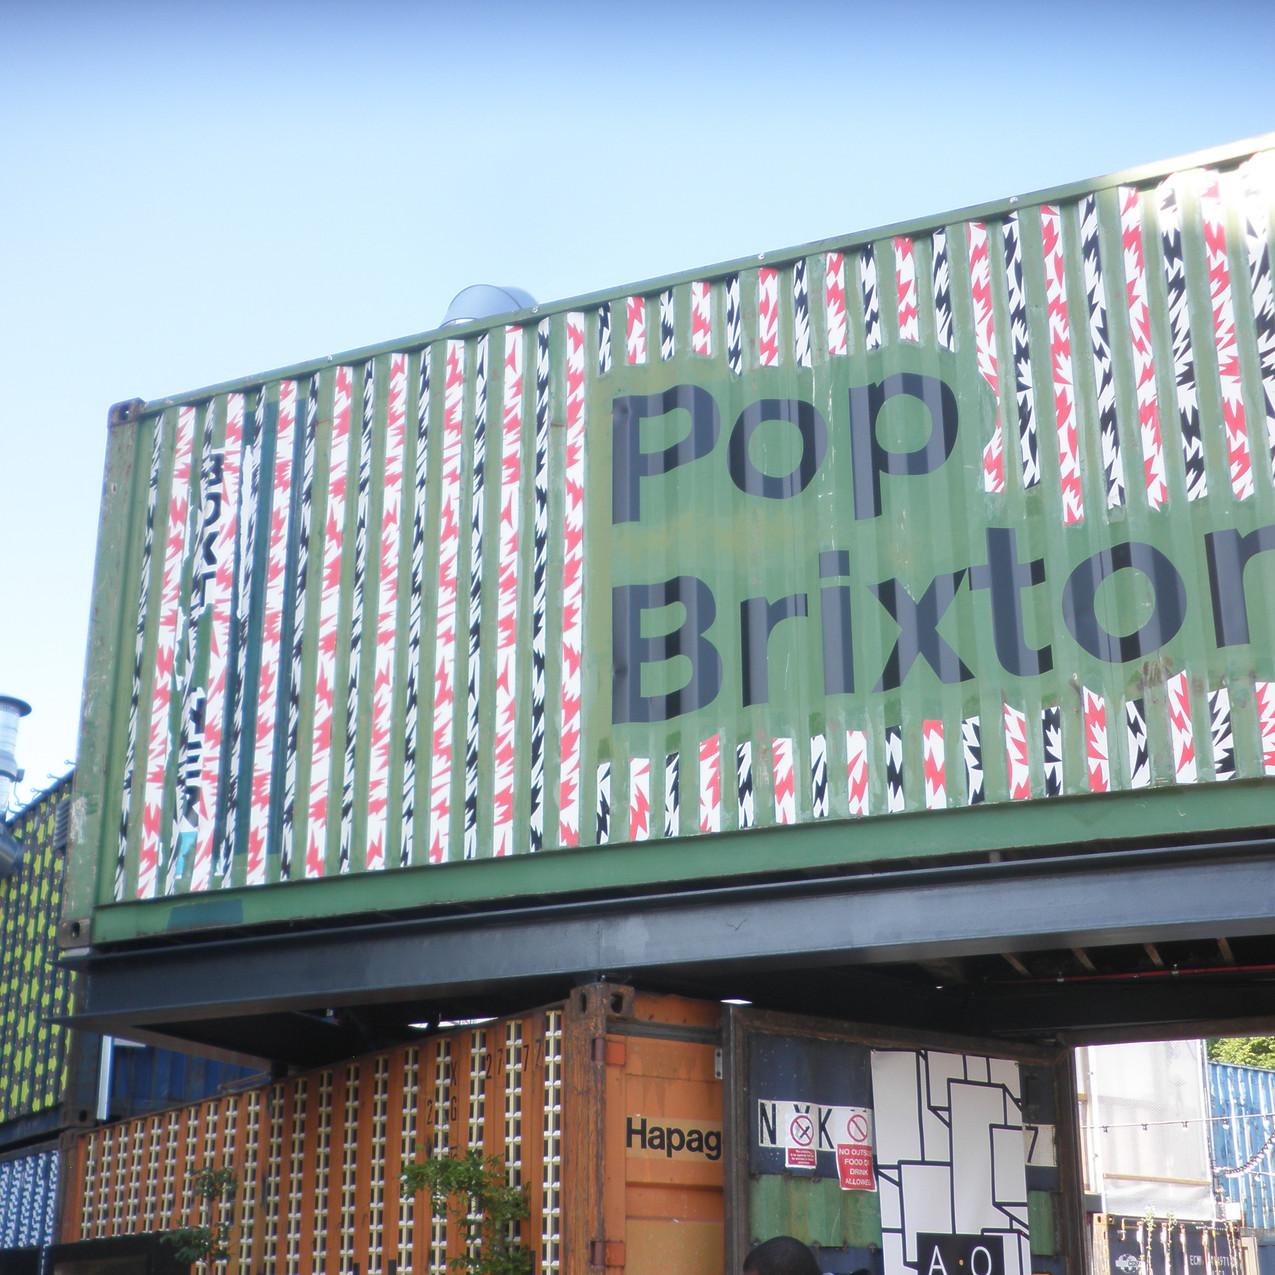 Pop Brixton